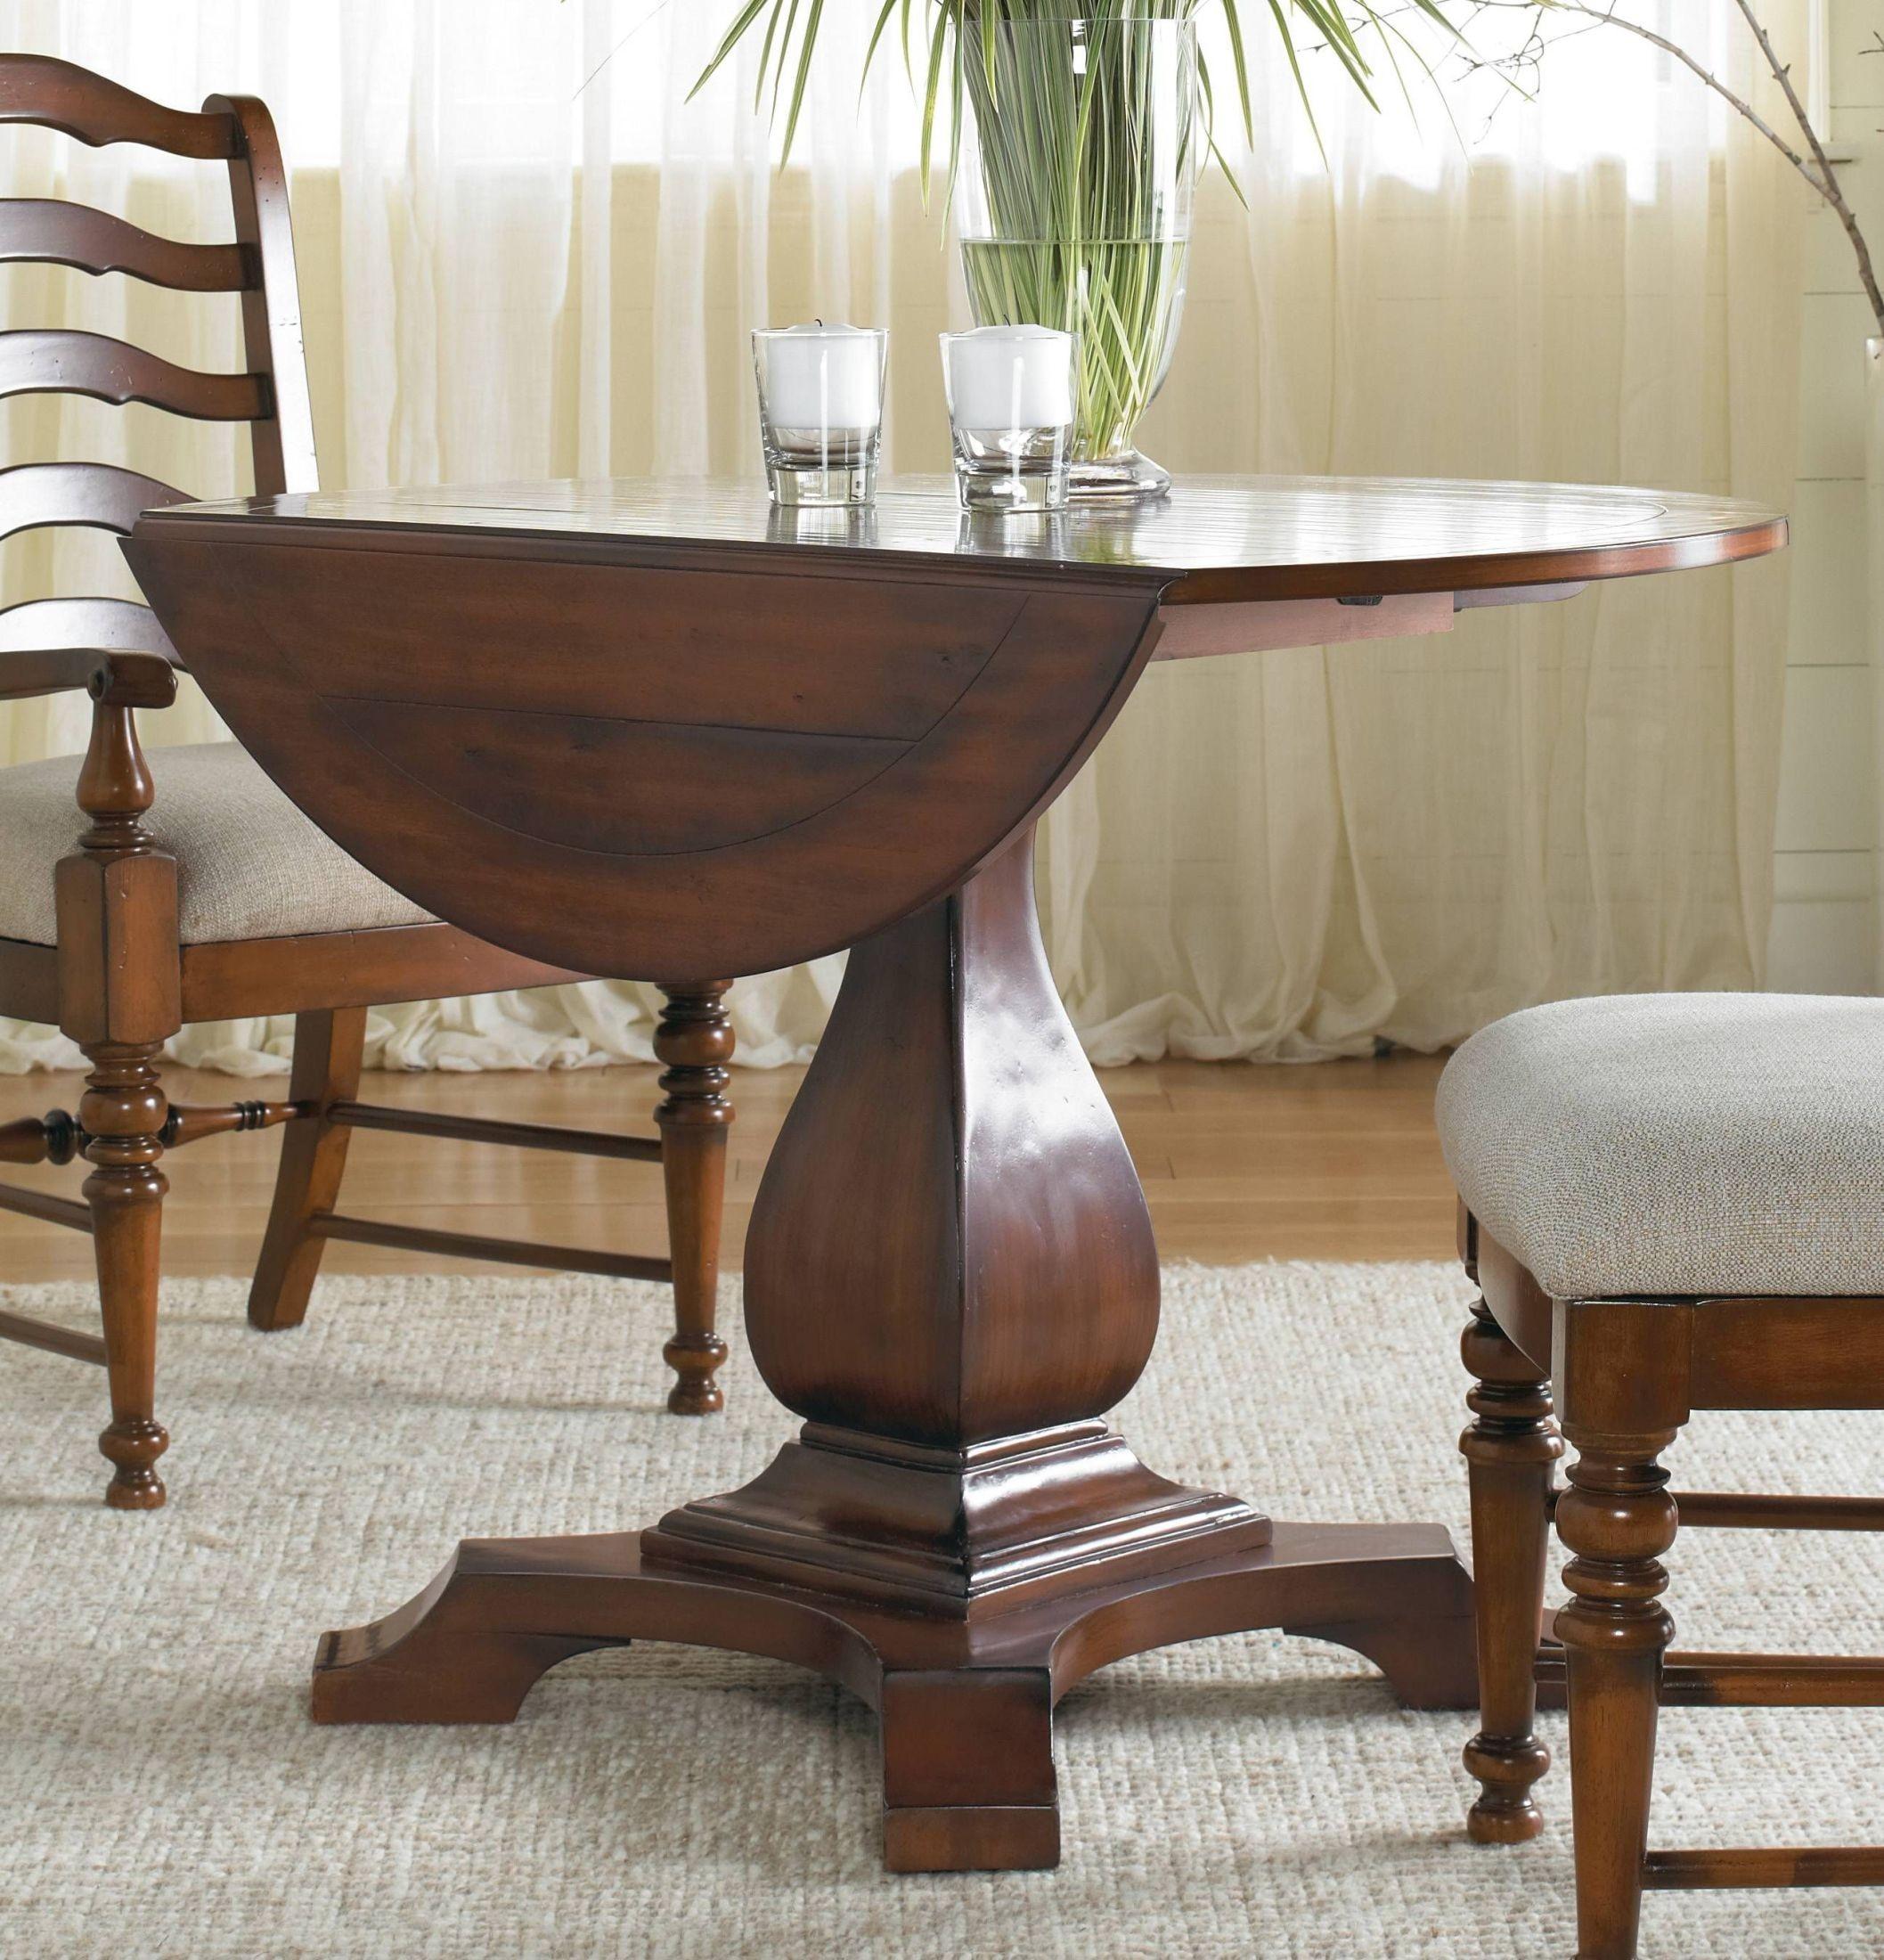 Waverly place cherry round drop leaf pedestal dining table for Round pedestal dining table set with leaf